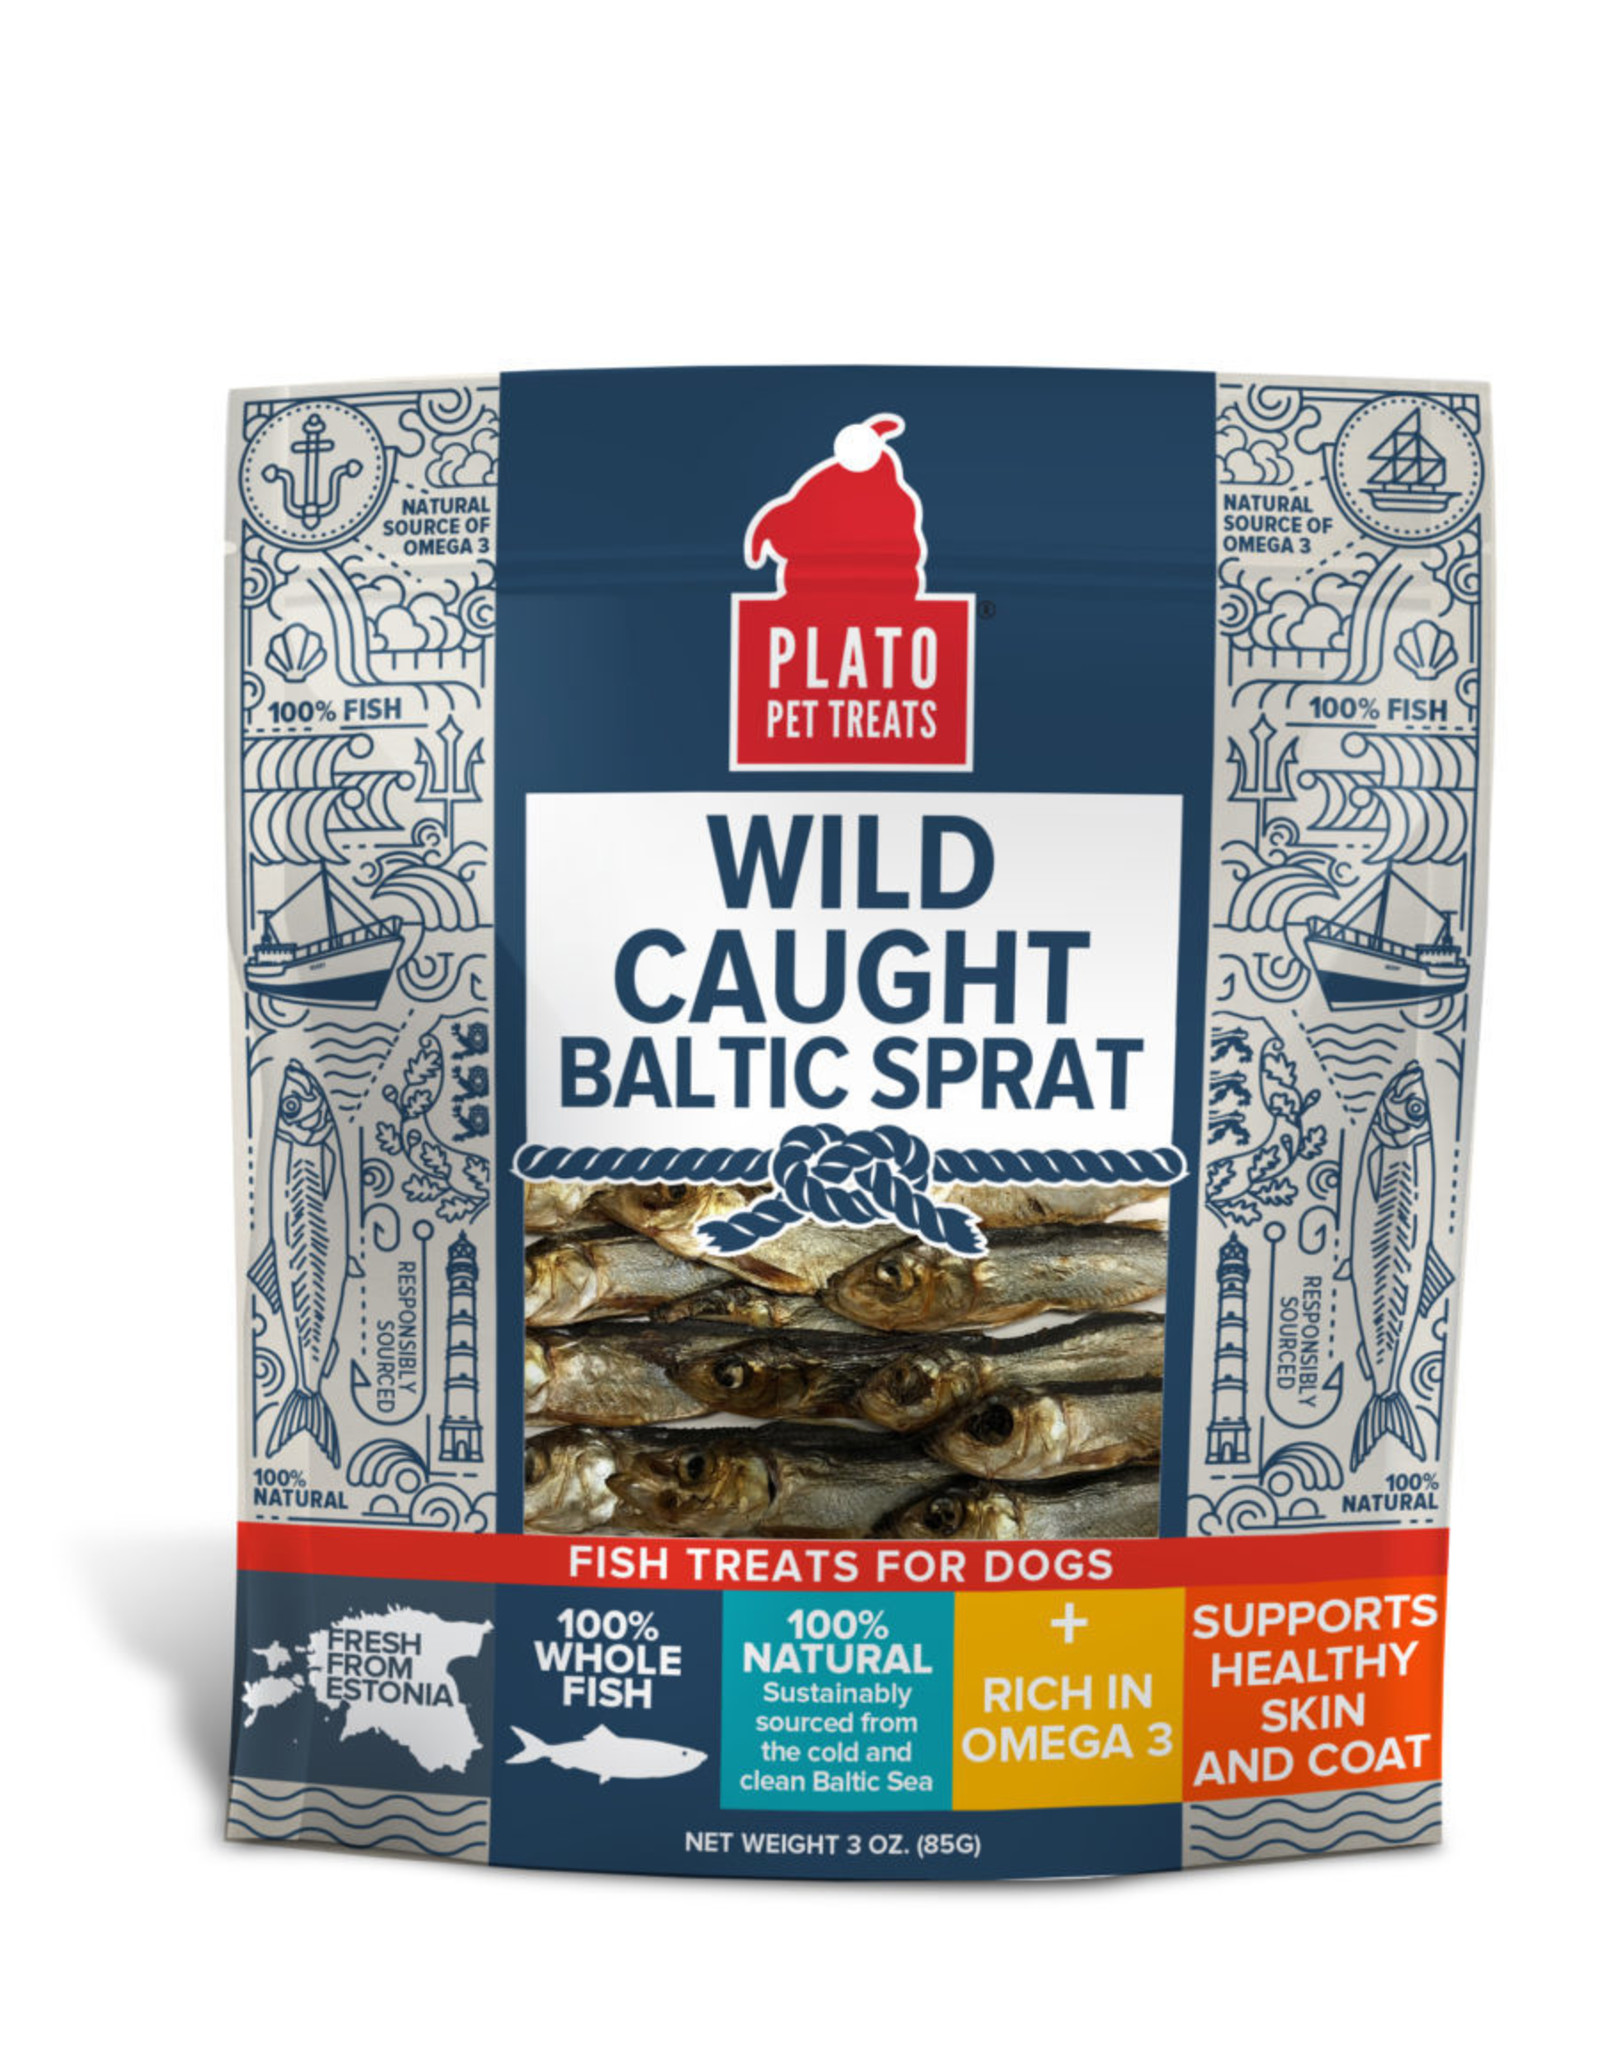 Plato Pet Treats Plato Wild Caught Baltic Sprat